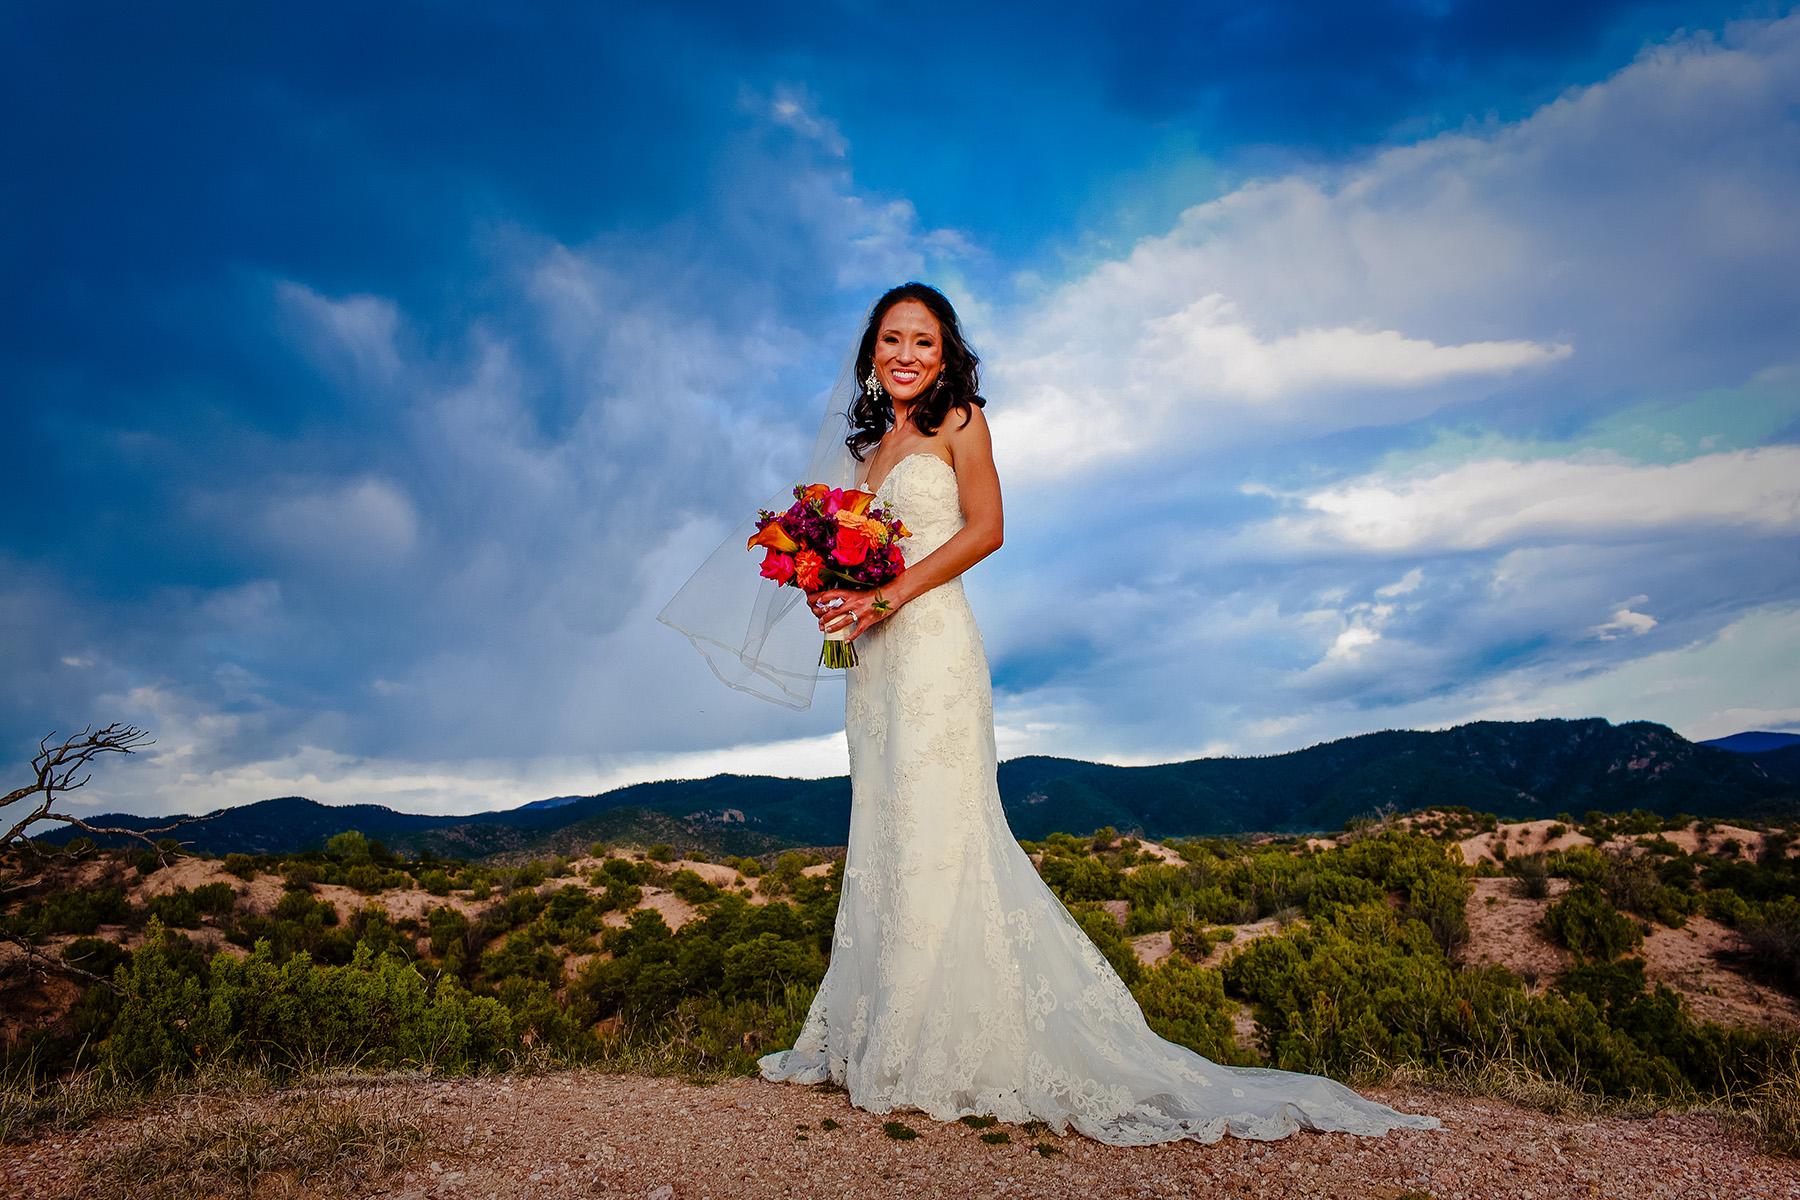 Tabitha-Dallas-wedding-four-seasons-resort-rancho-encantado-santa-fe-new-mexico-1058